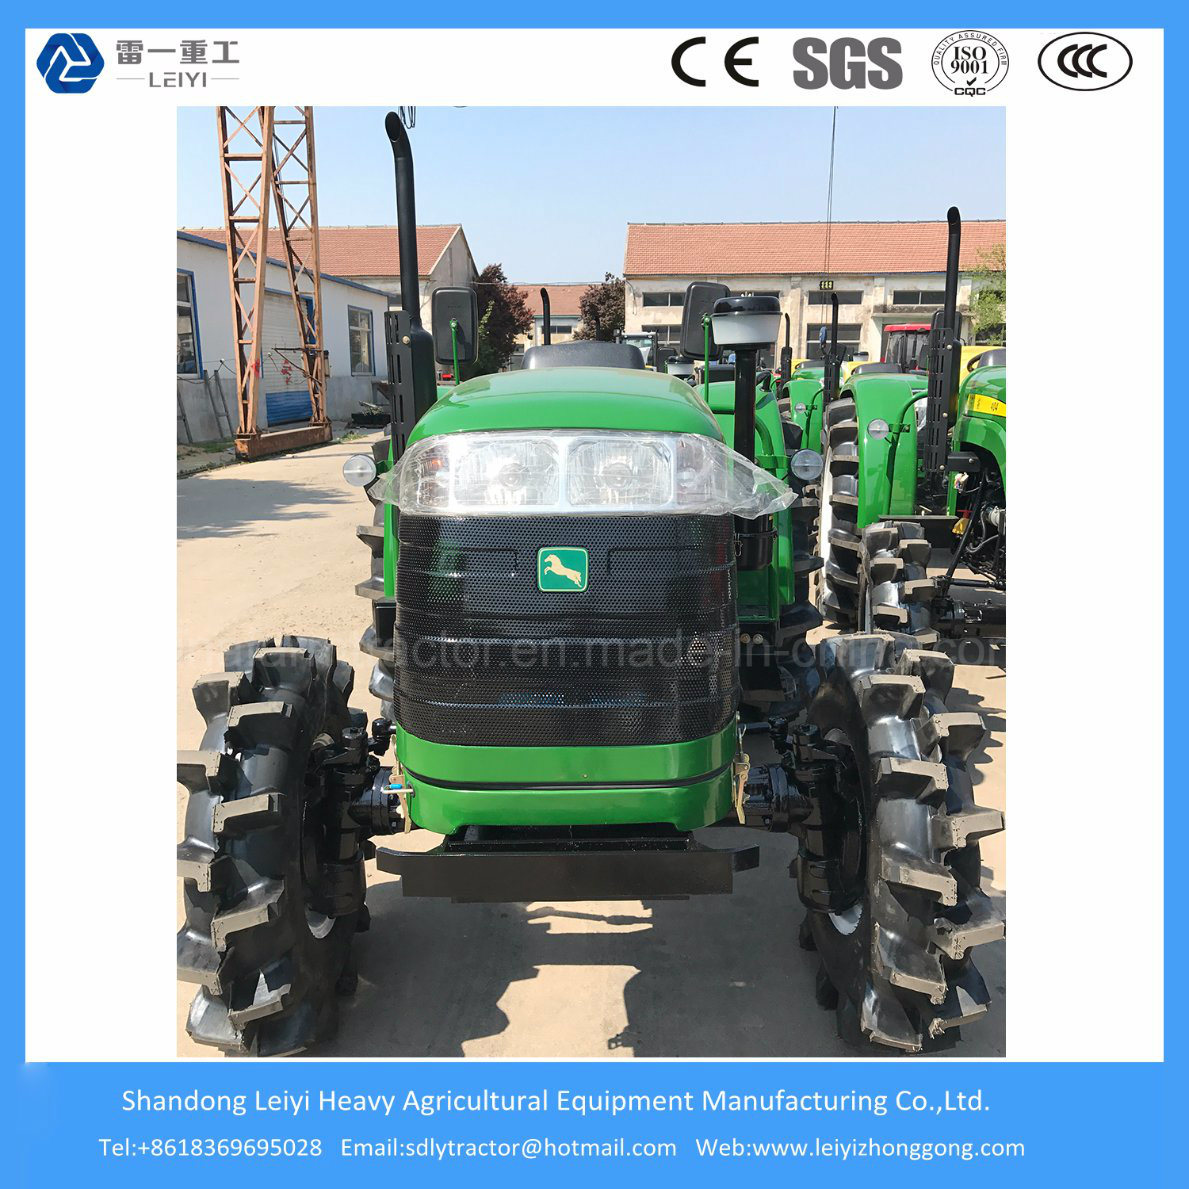 4WD Wheel Farming 40/48/55HP Mini/Agricultural/Compact/Small/Diesel Farm/Garden Tractor